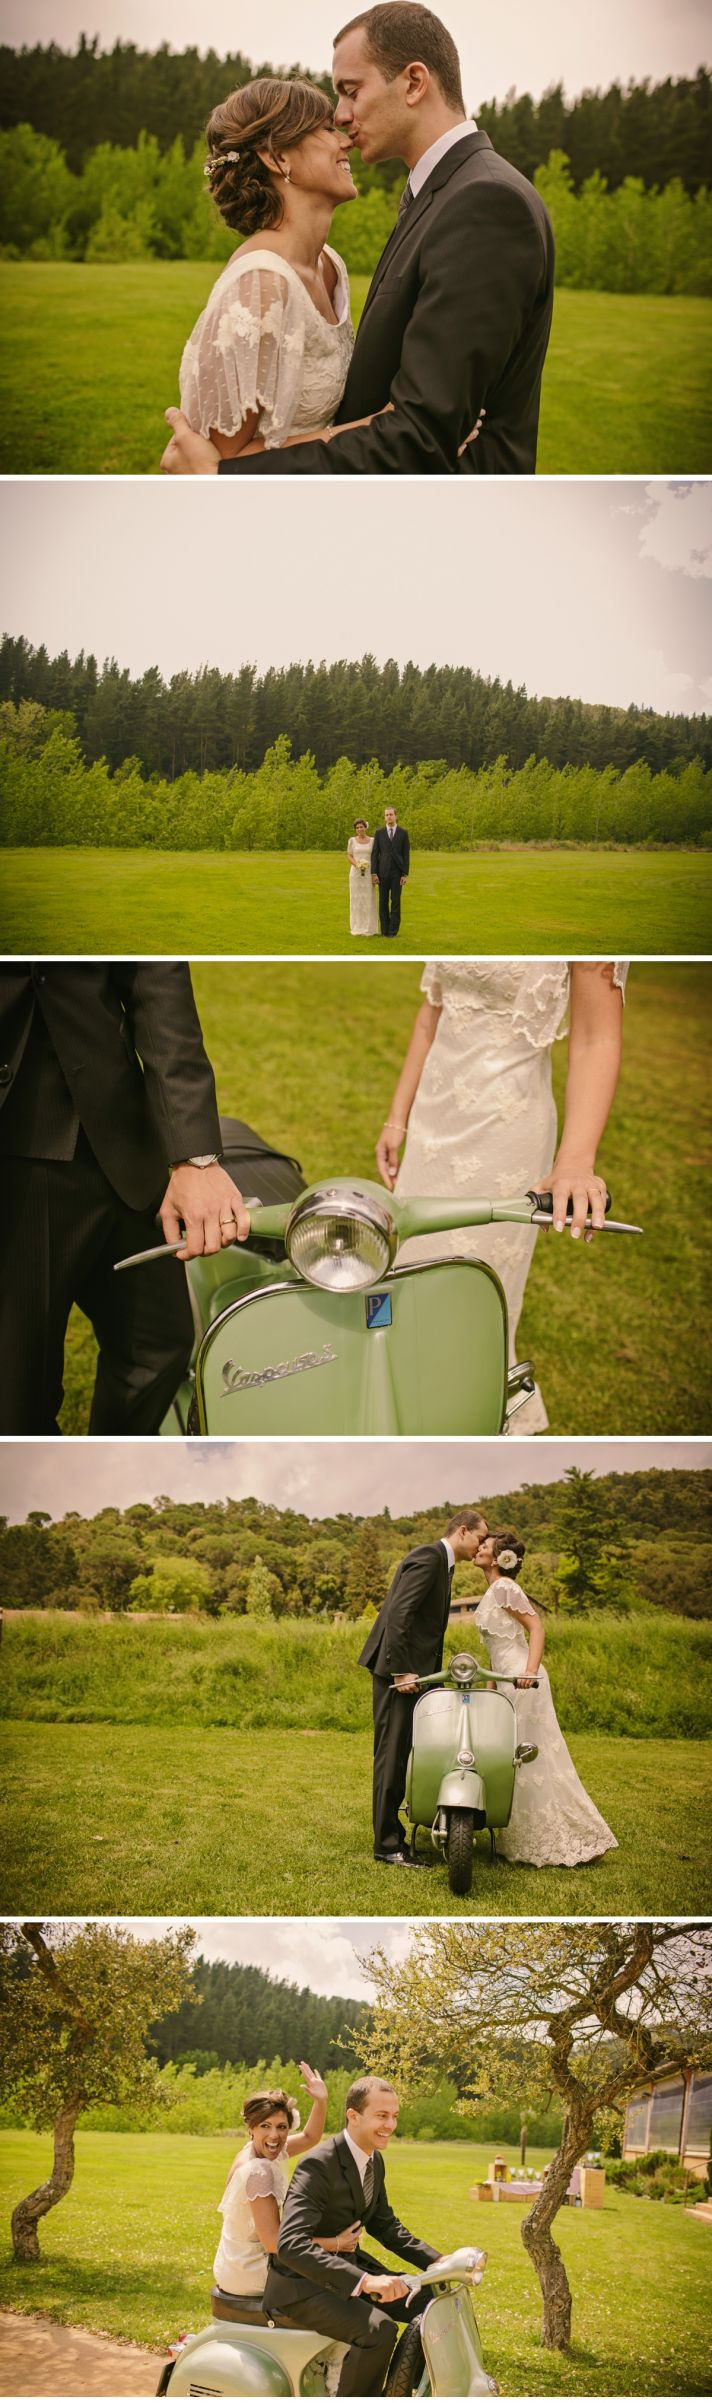 Real Spanish Wedding Otaduy Wedding Dress Outdoor Romantic Bride and Groom on Vespa